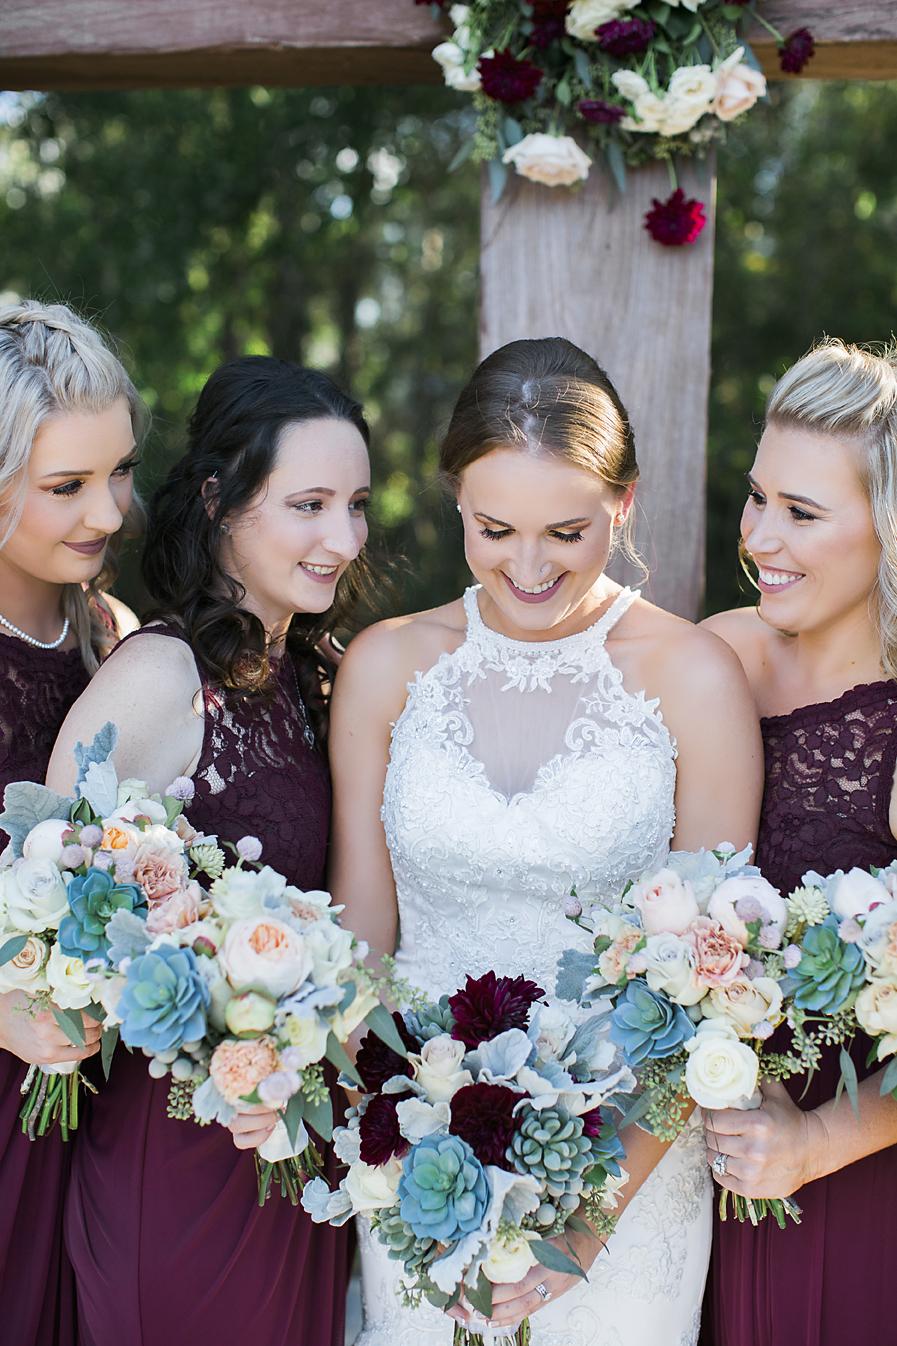 Alisha + Erik - The White Barn Wedding Photography - Preview Photos - Emily & Co.jpg